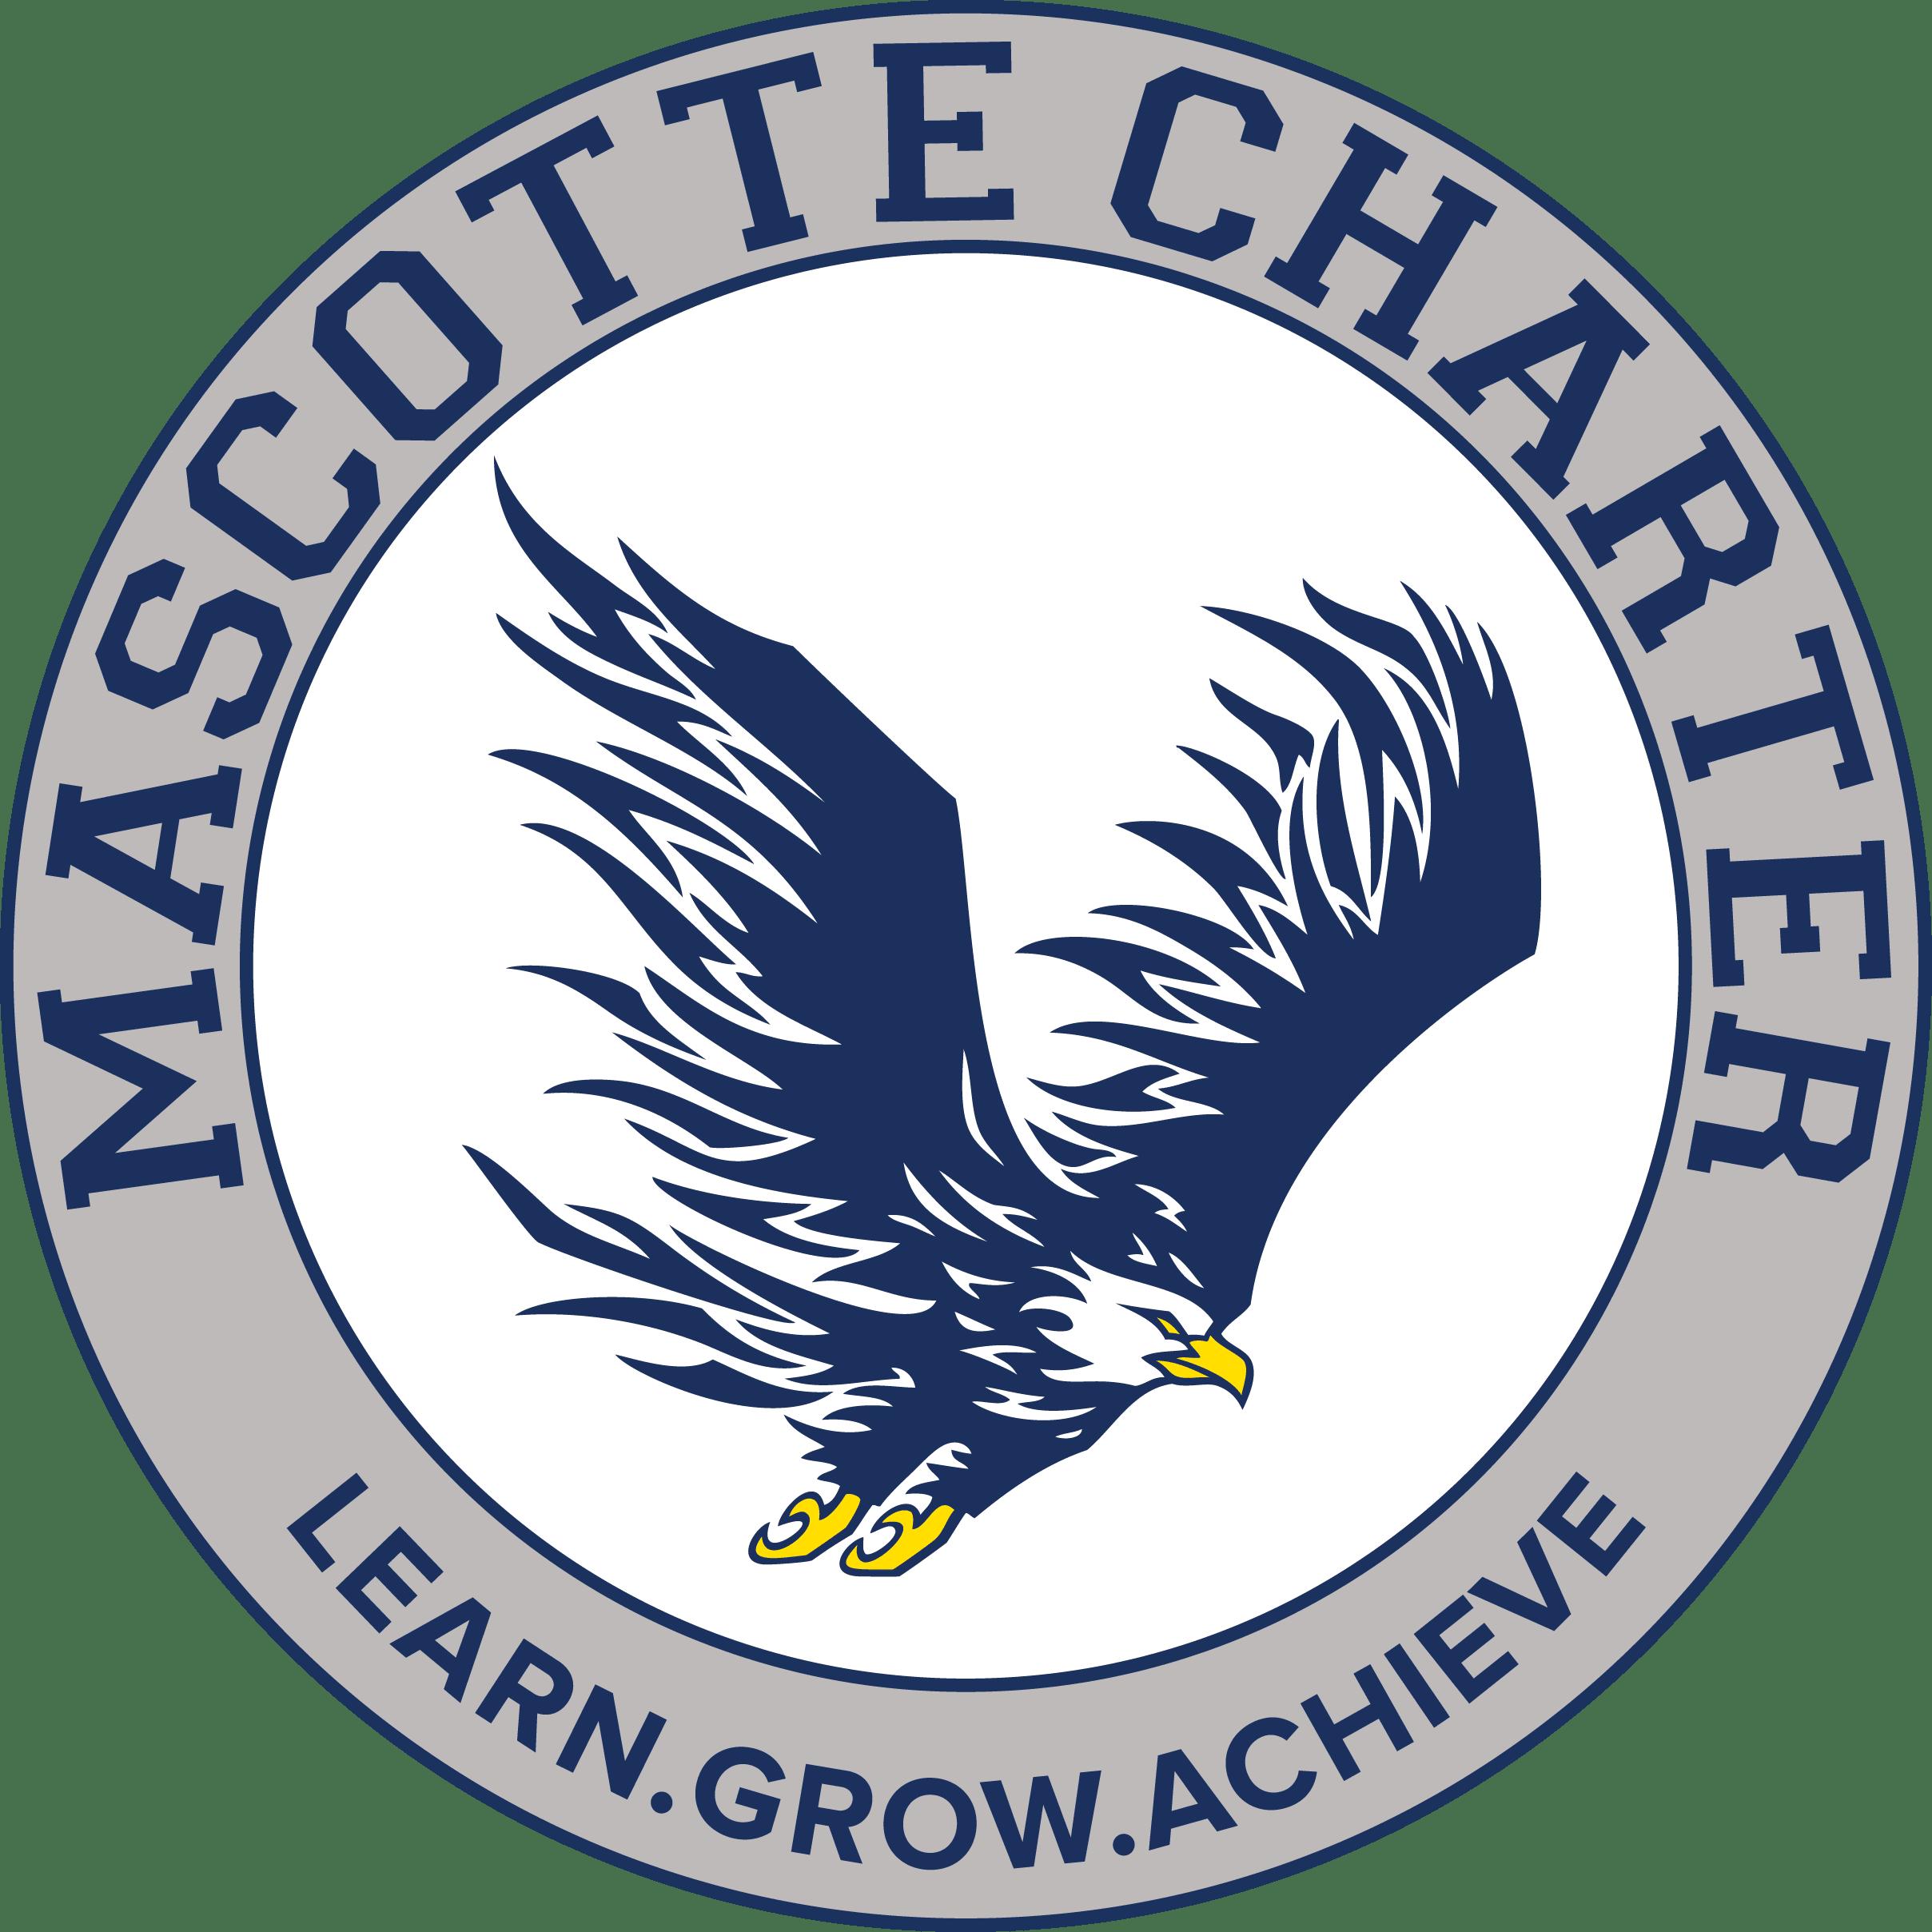 Home - Mascotte Charter